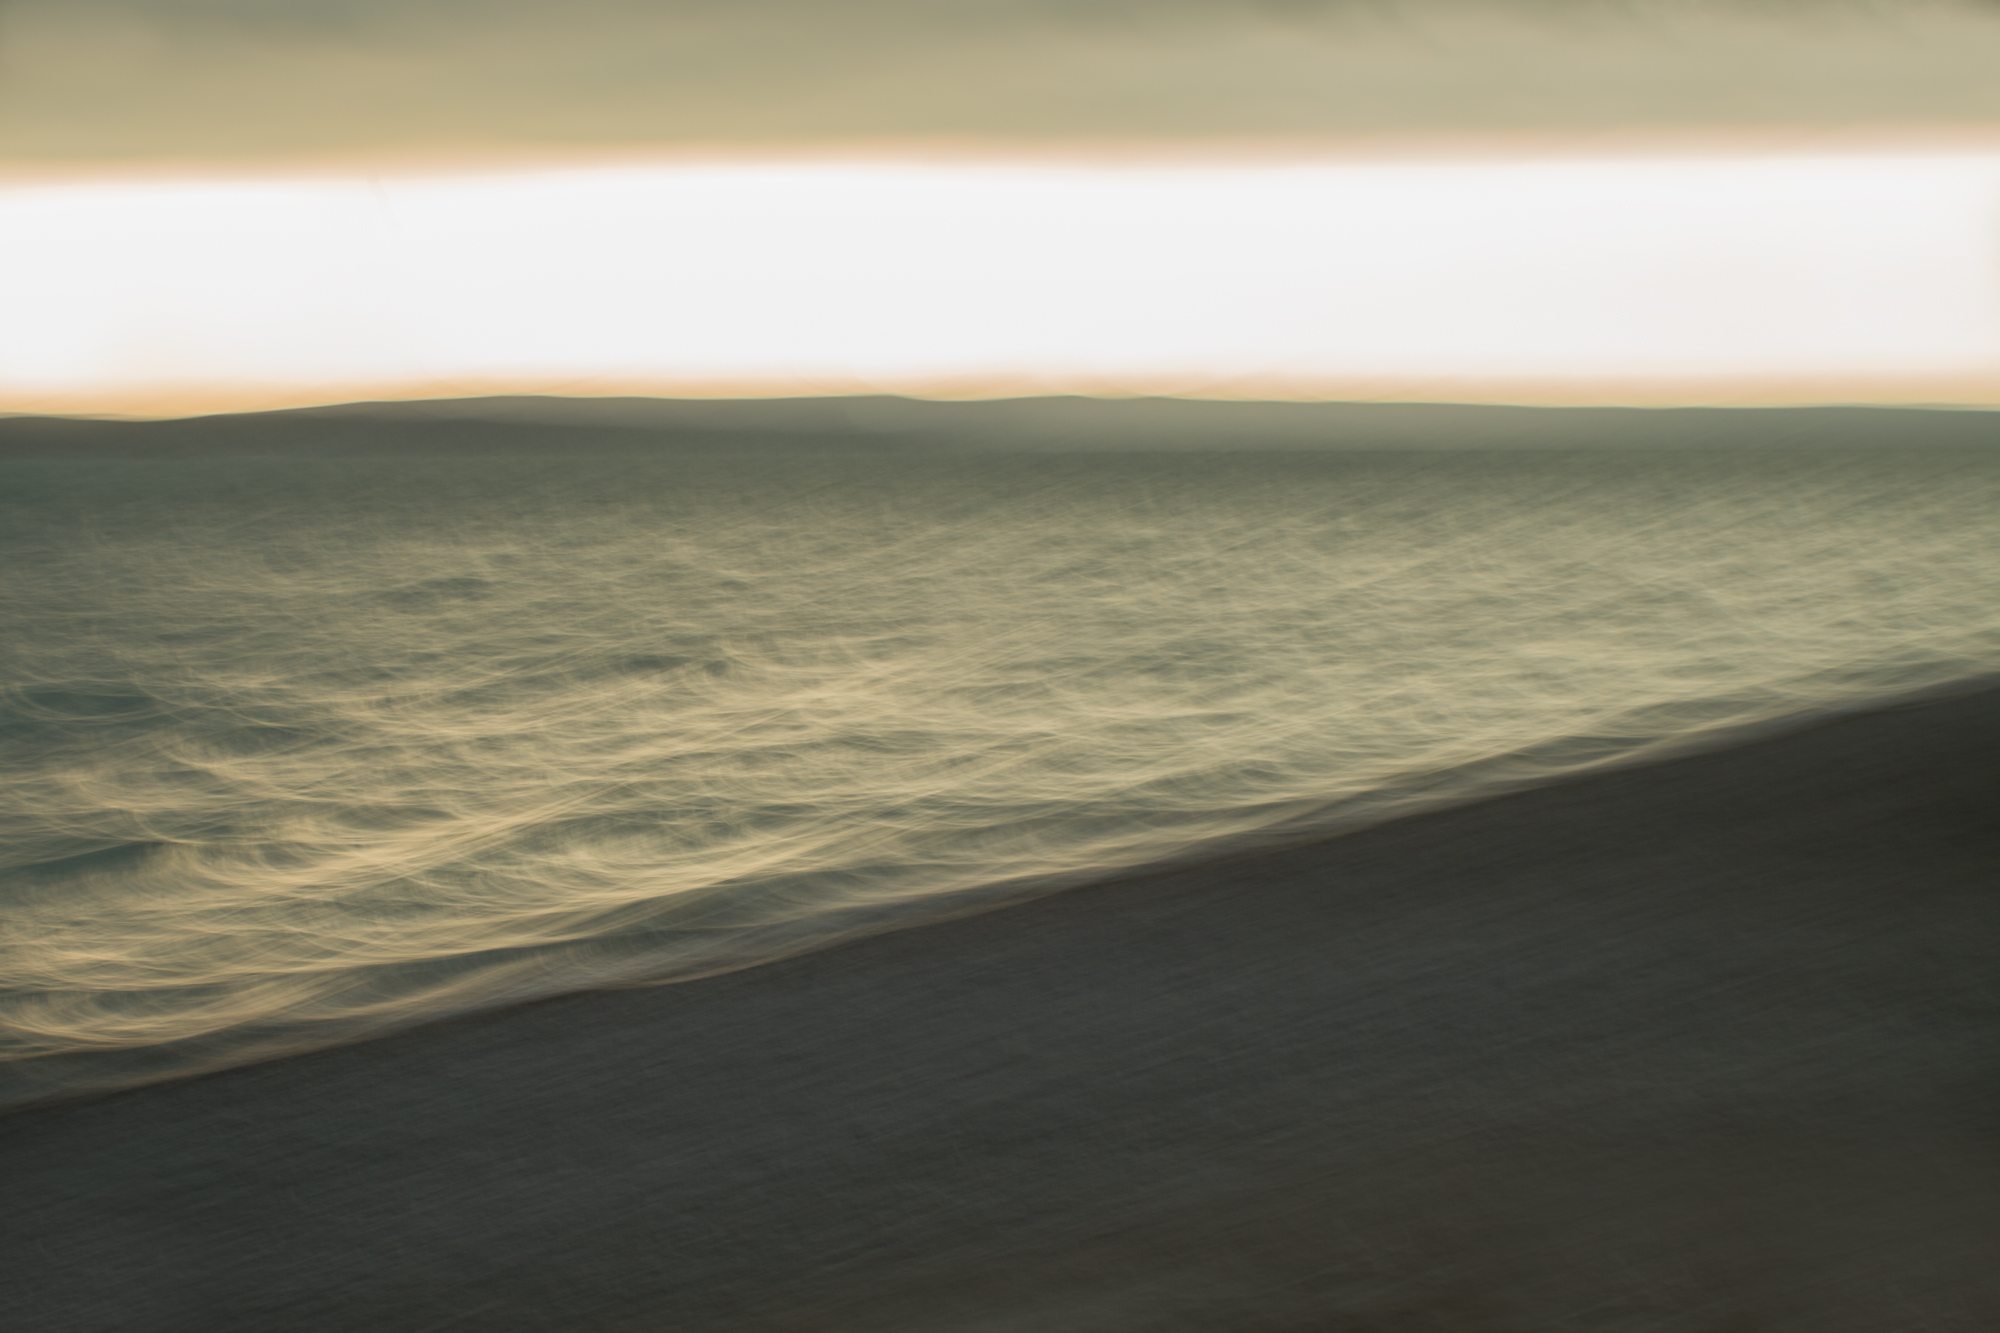 Anatoly Rudakov, After the Storm on Lake Starnberg, 2013